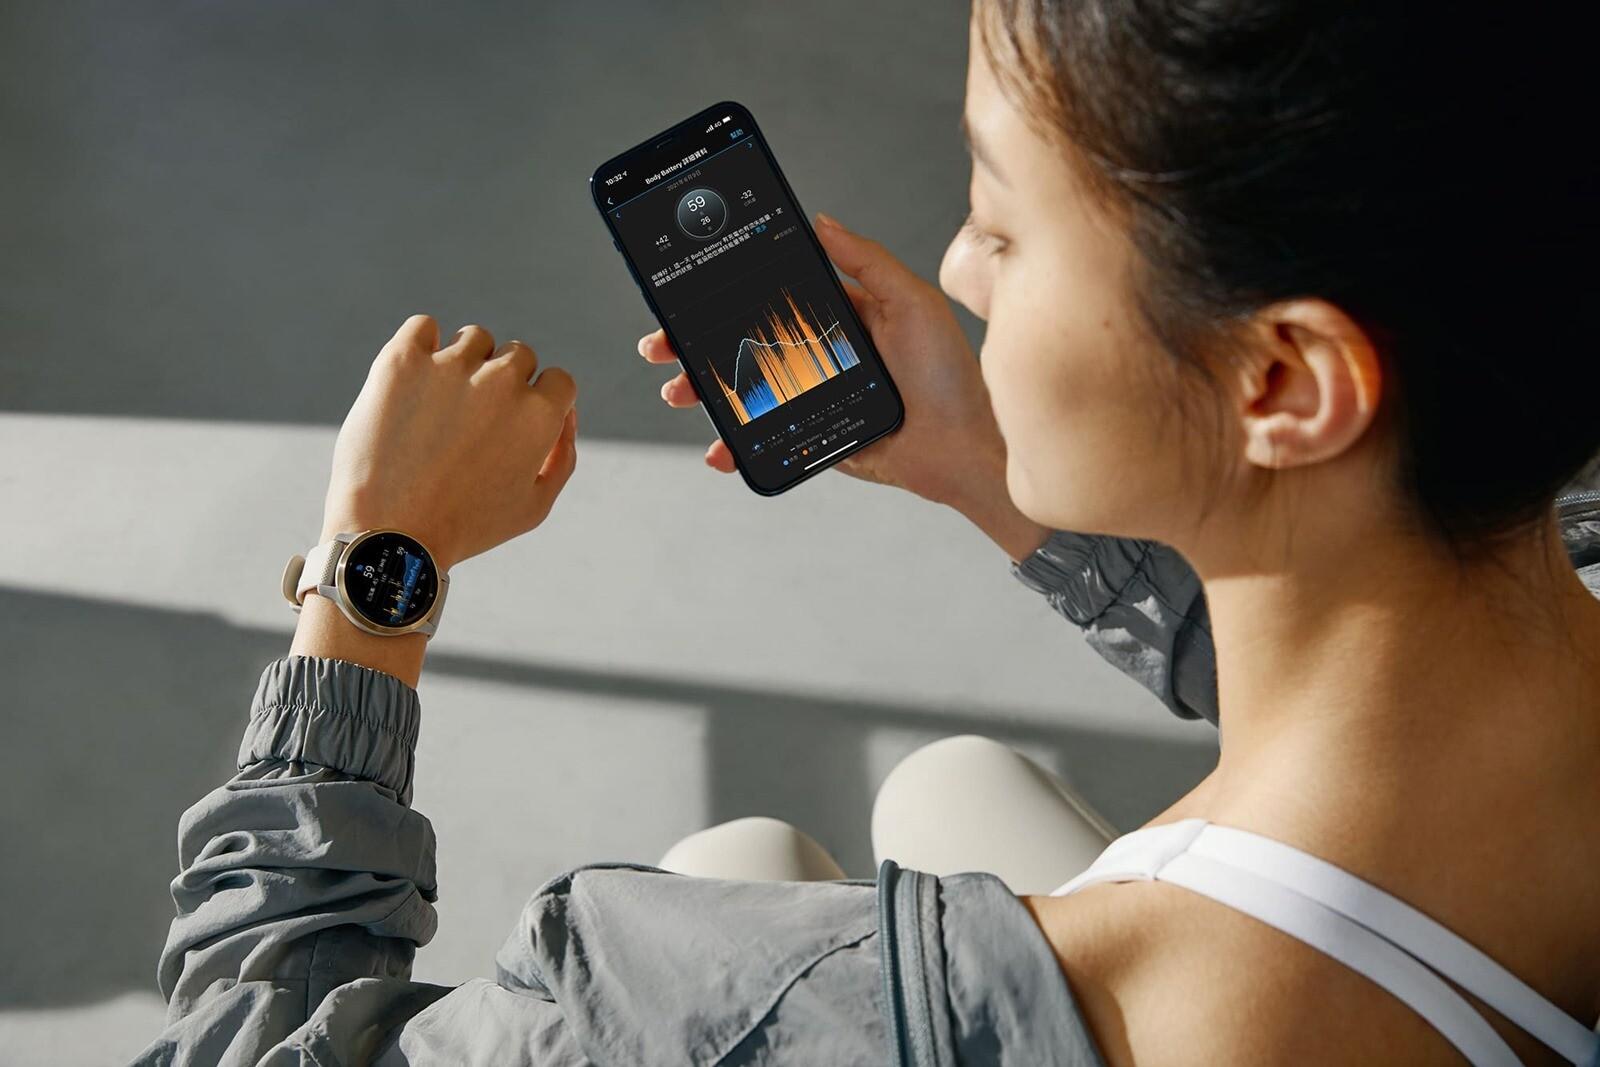 Garmin 相信透過科學化監測,追求健康有憑有據,無論是練肌肉或練出更好的睡眠習慣,健康生活都是「練」出來的.jpg @3C 達人廖阿輝